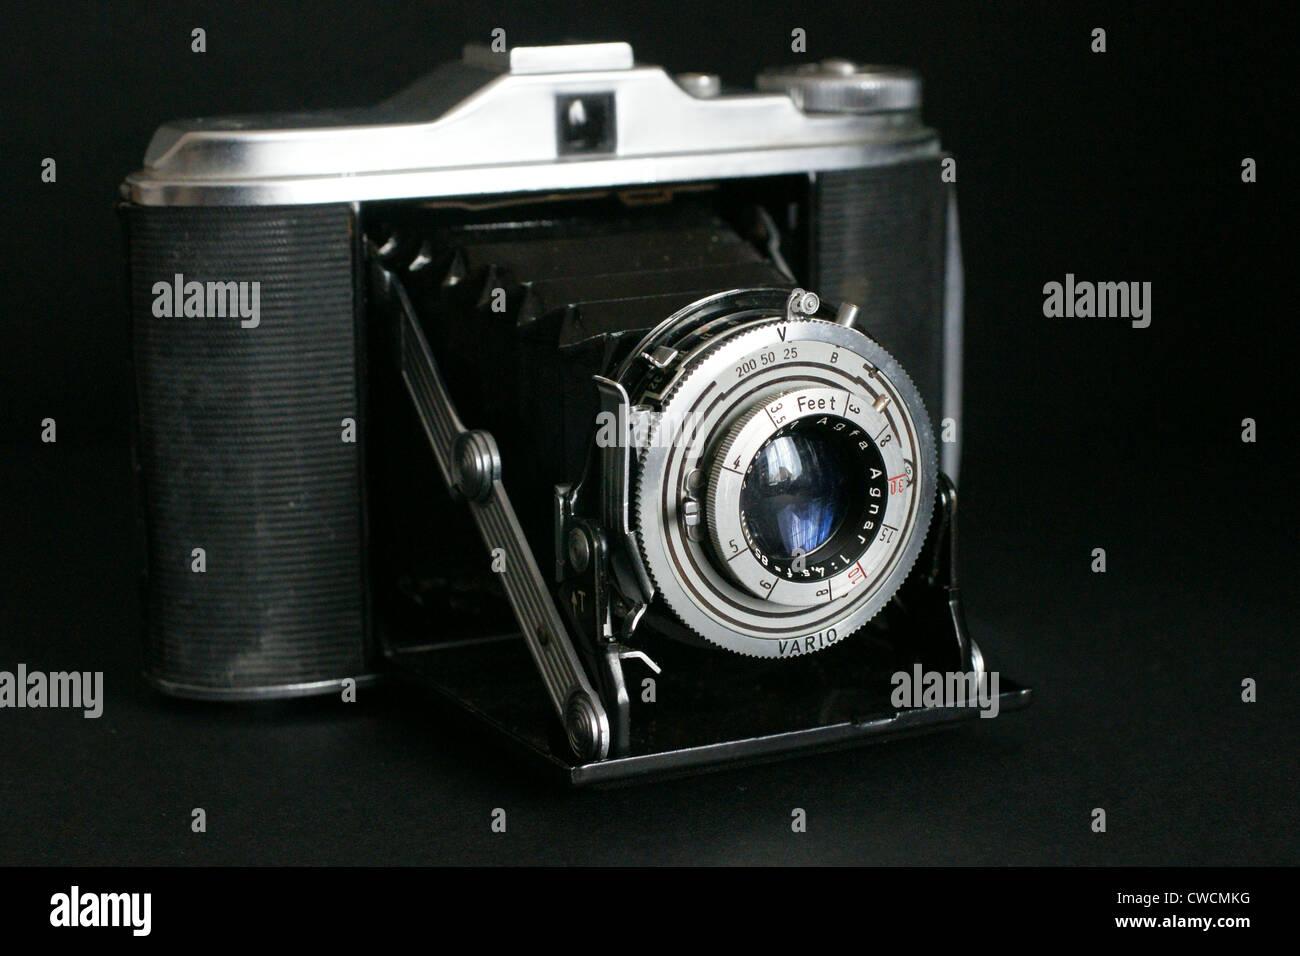 Vintage Agfa Isollette camera - Stock Image